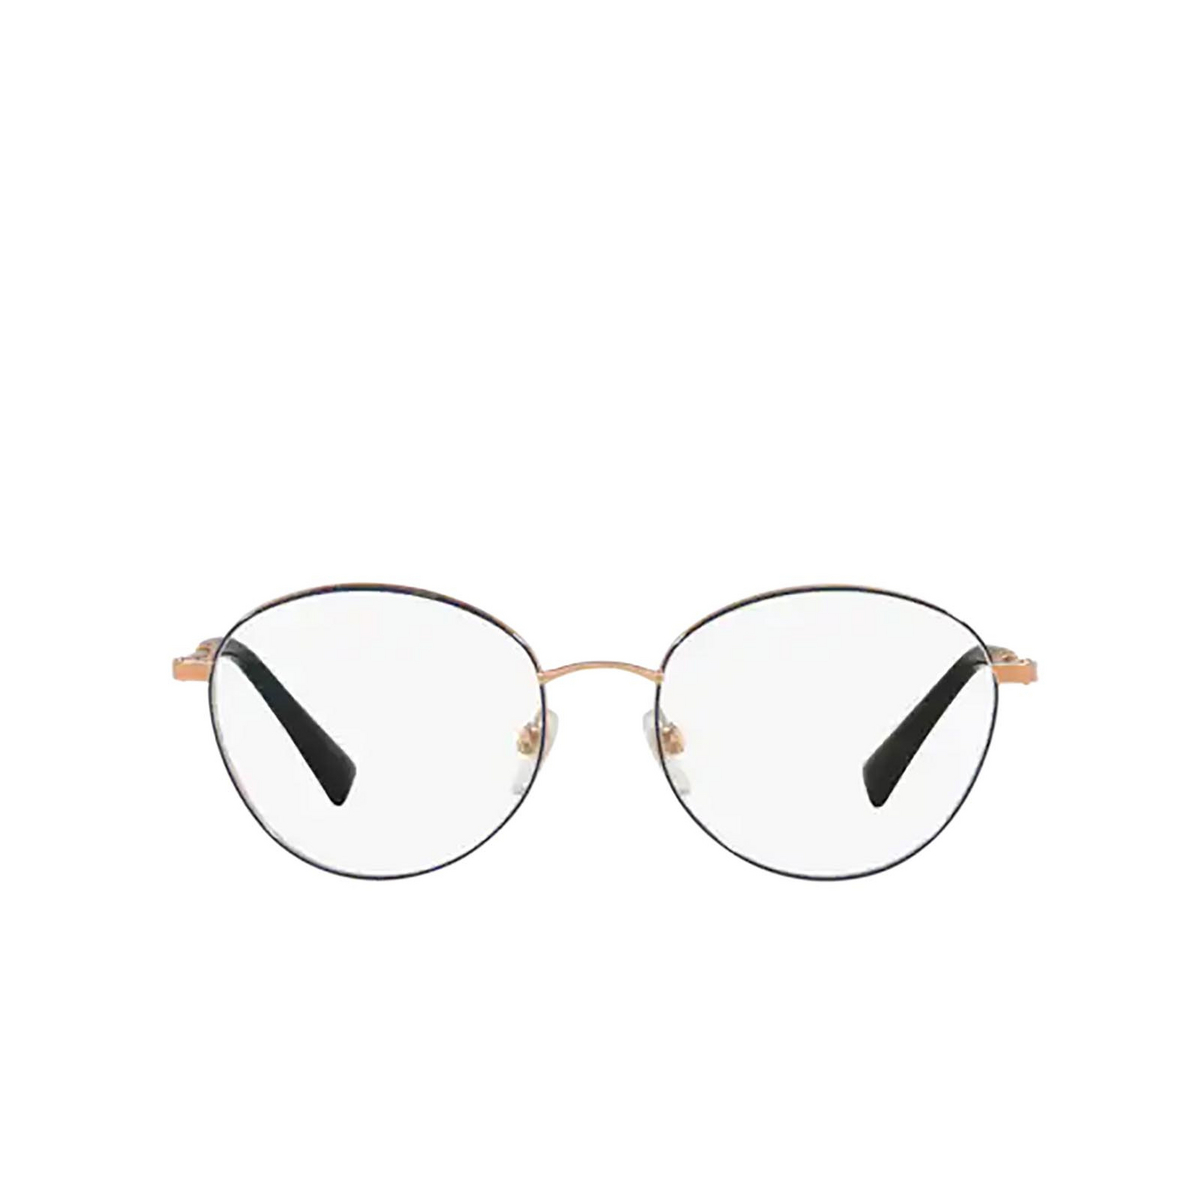 Valentino® Oval Eyeglasses: VA1003 color Rose Gold / Blue 3031 - front view.